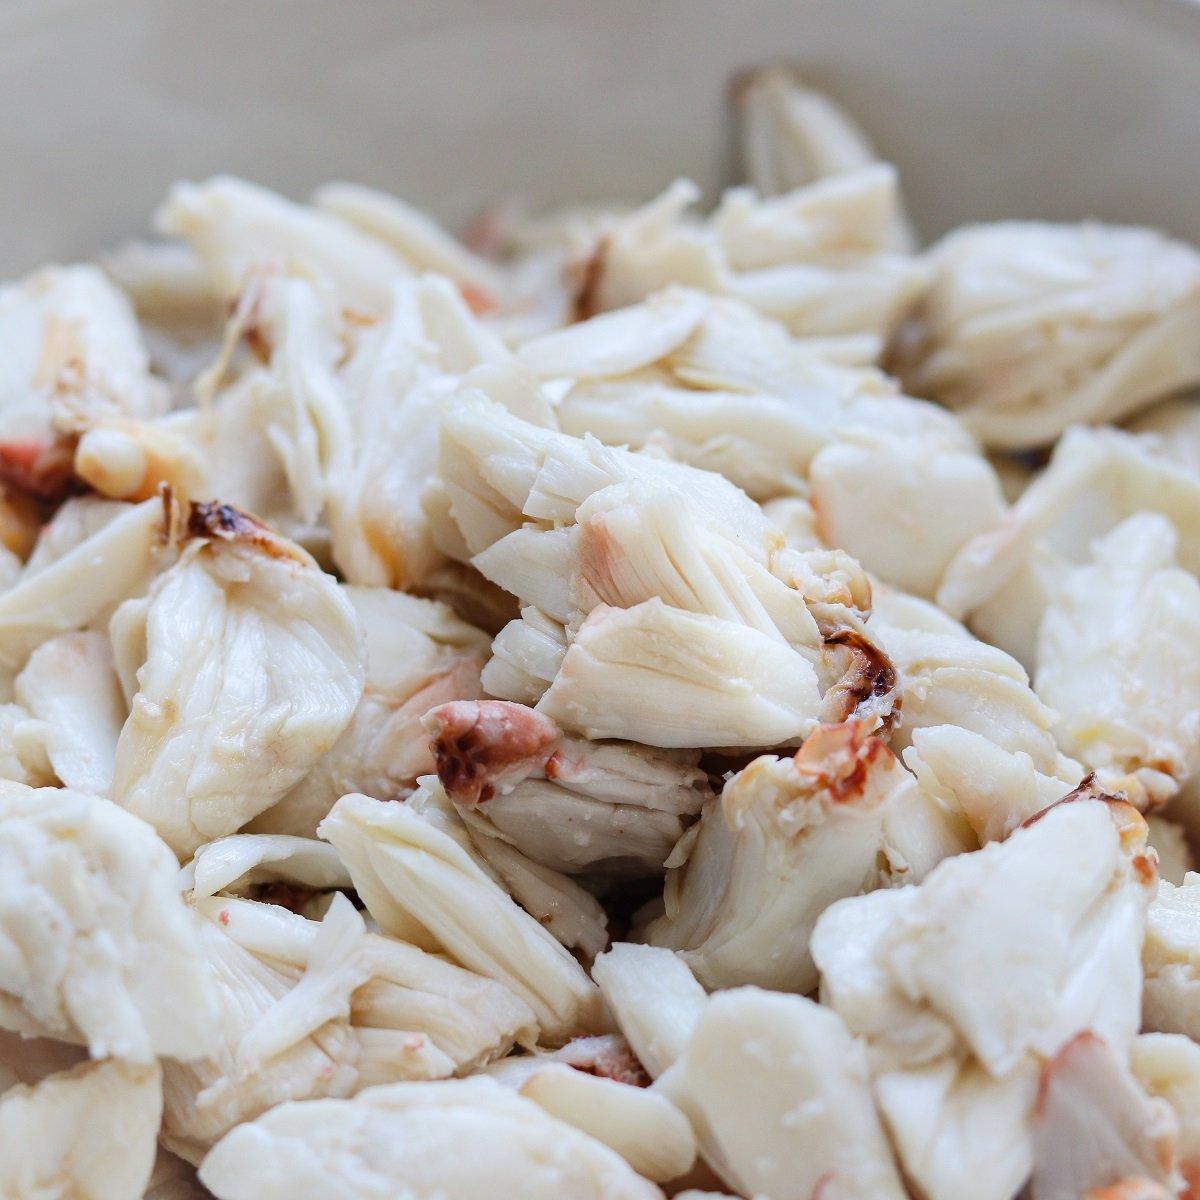 Jumbo lump crab meat in white bowl.